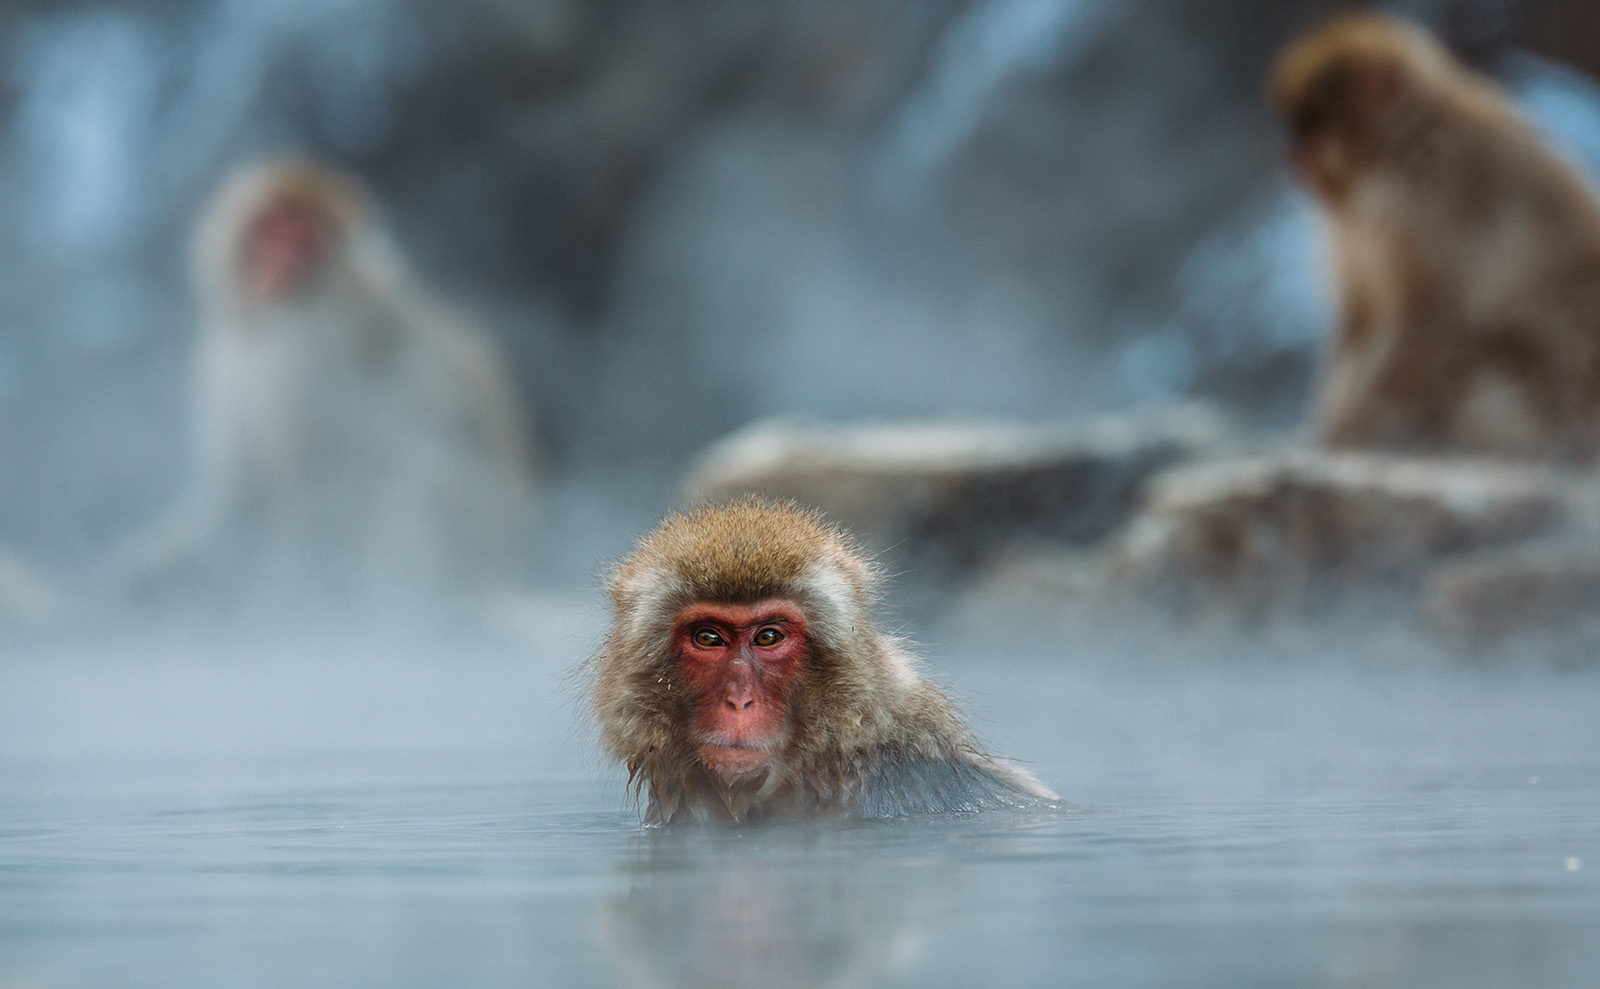 monkeys in the hot springs in Yamanouchi, Japan